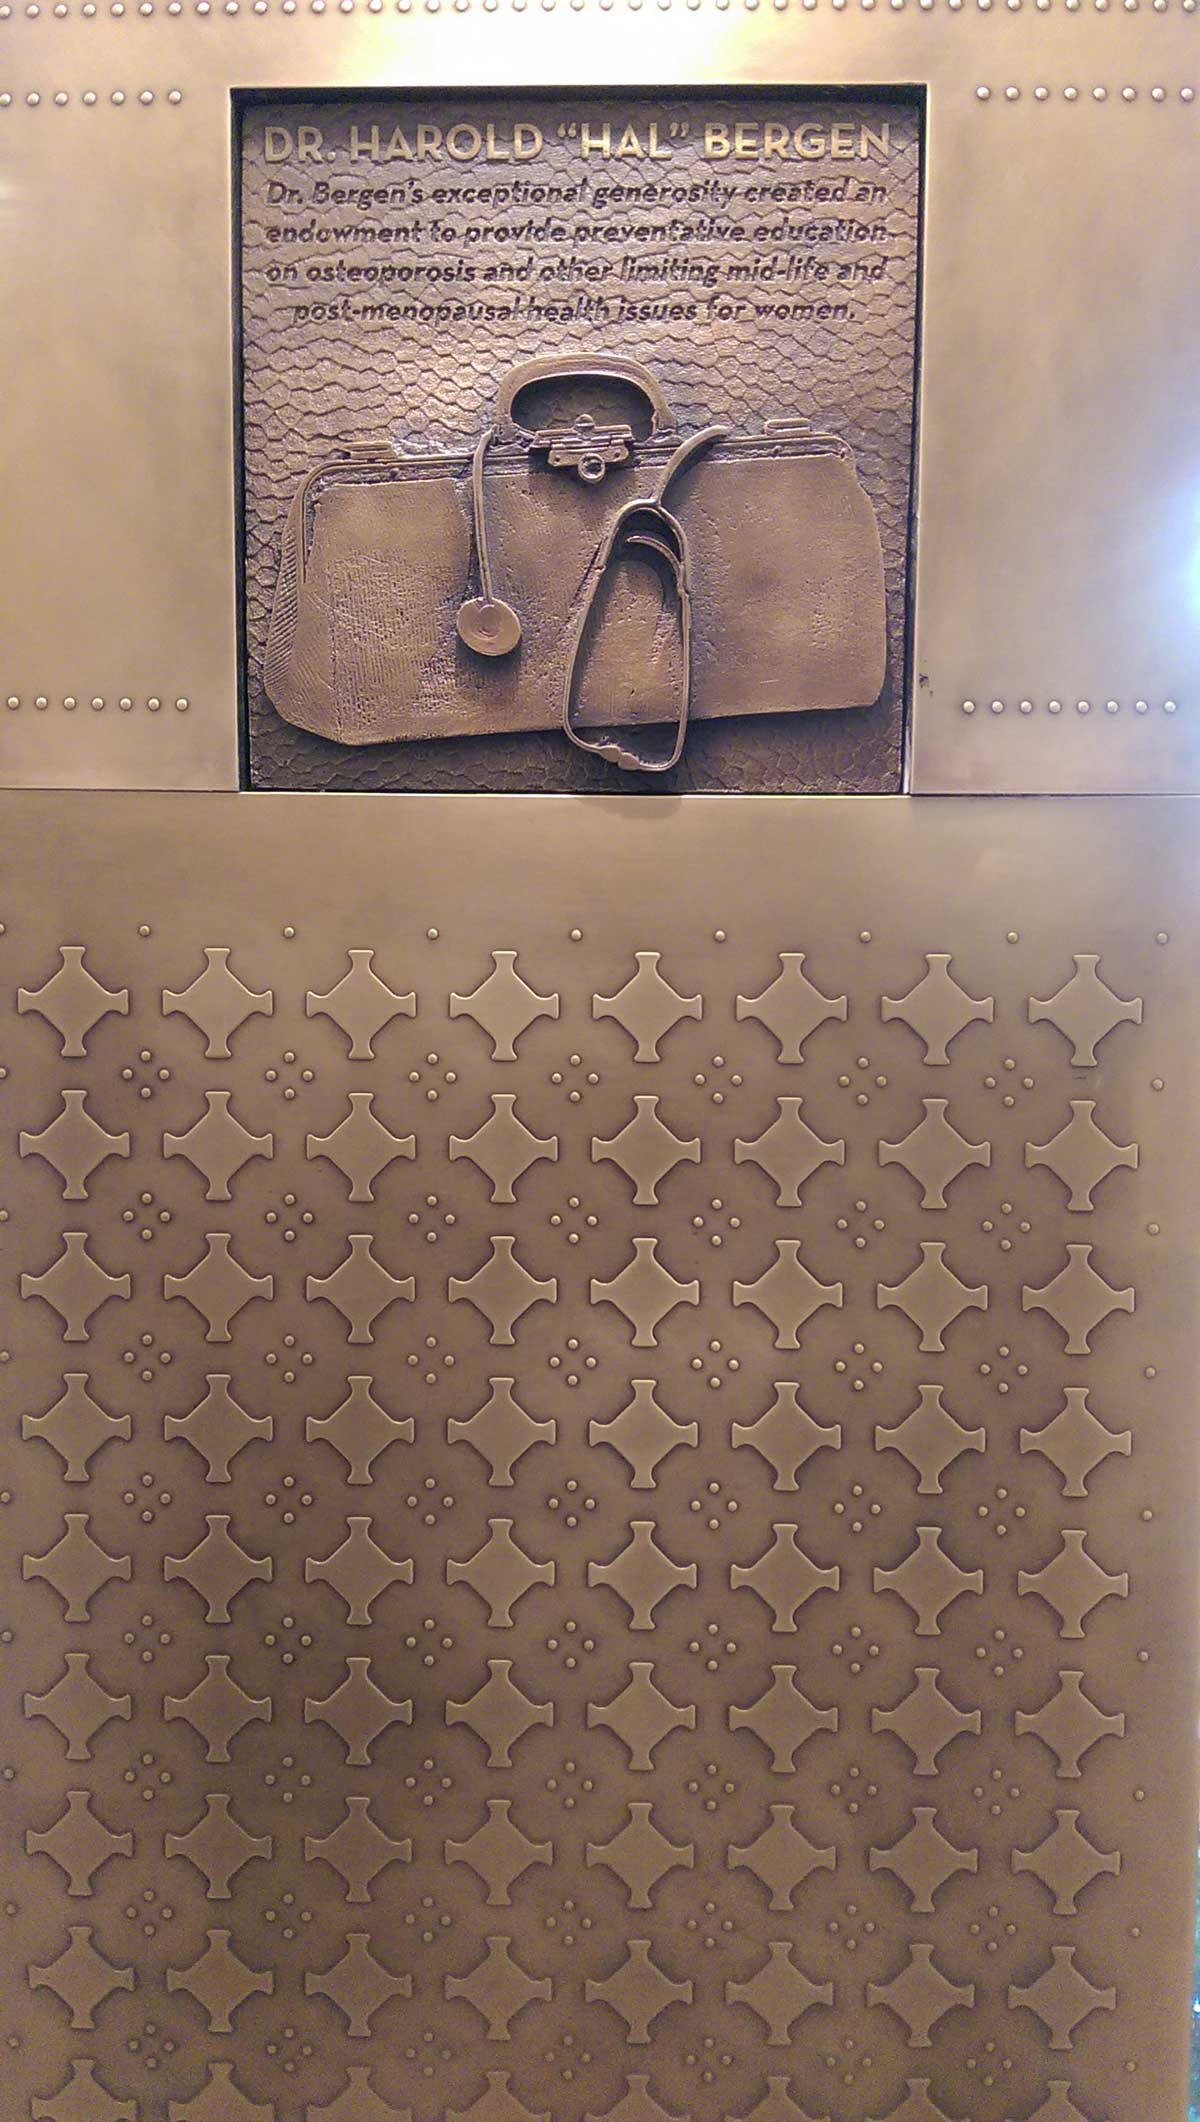 seattle-bronze-cast-image-1